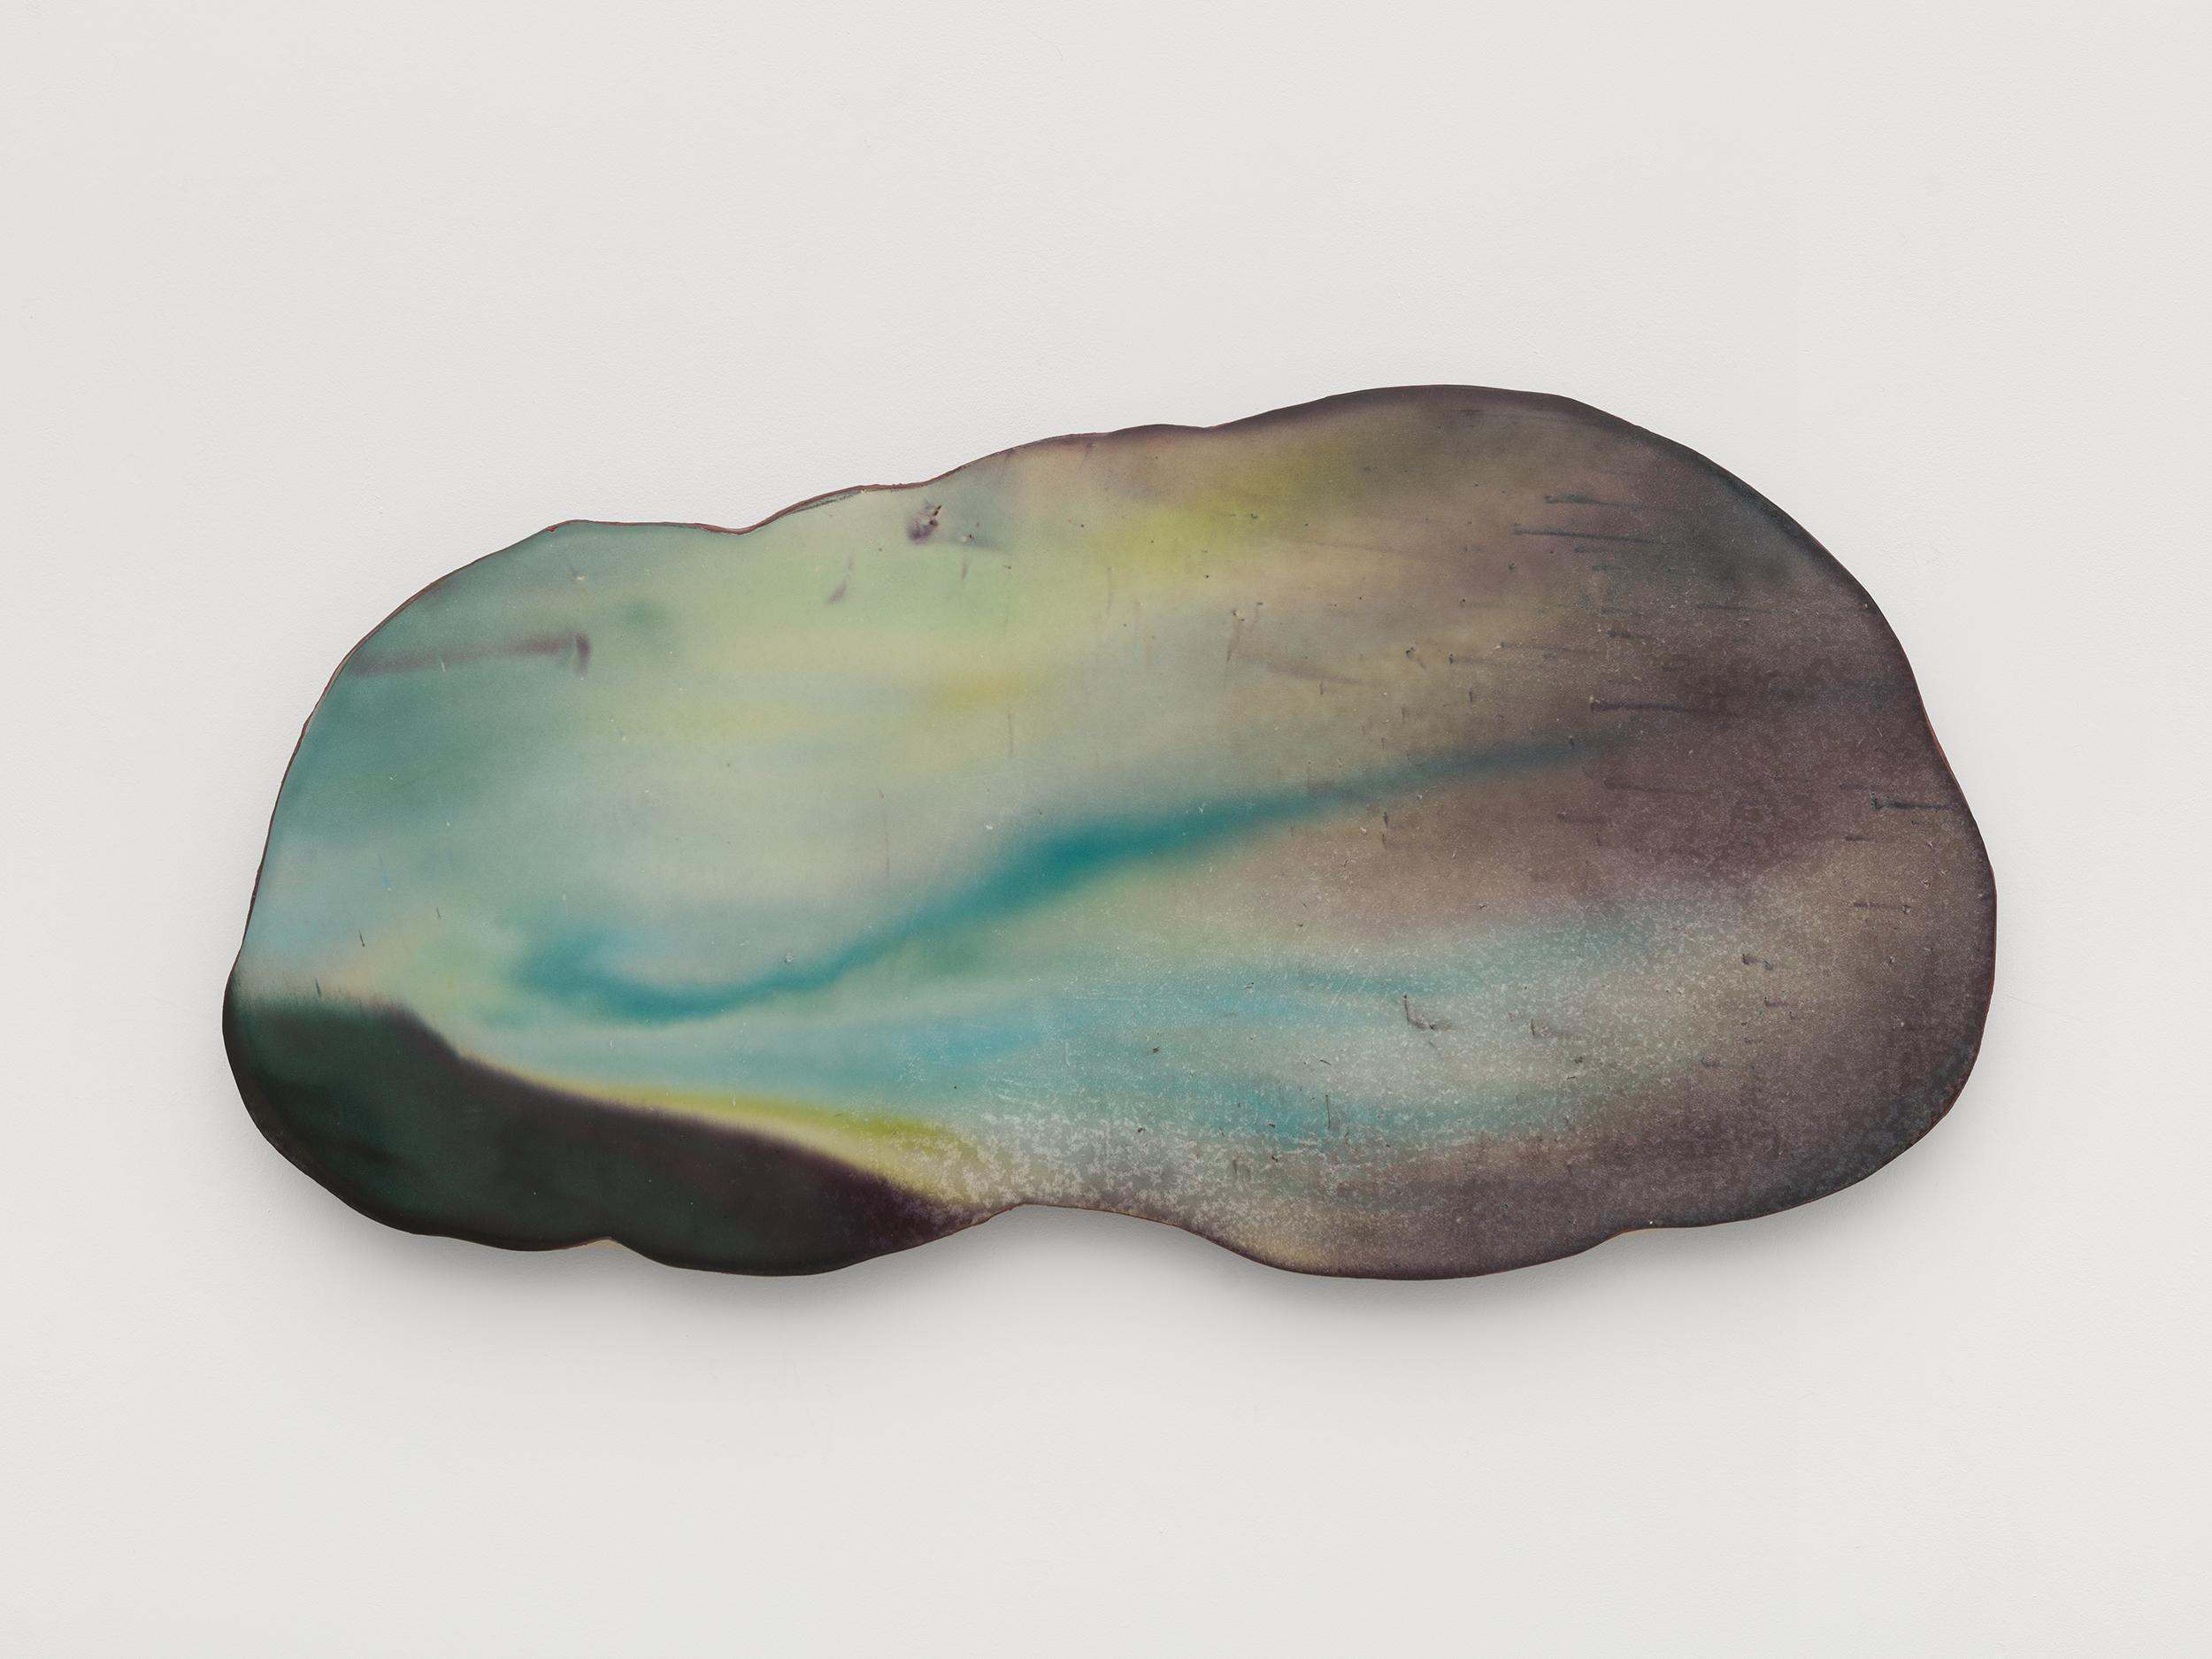 Harminder Judge, Untitled (as the sugarcane parts), 2021 plaster, polymer, pigment, scrim, oil, wax 43 x 84 x 4 cm